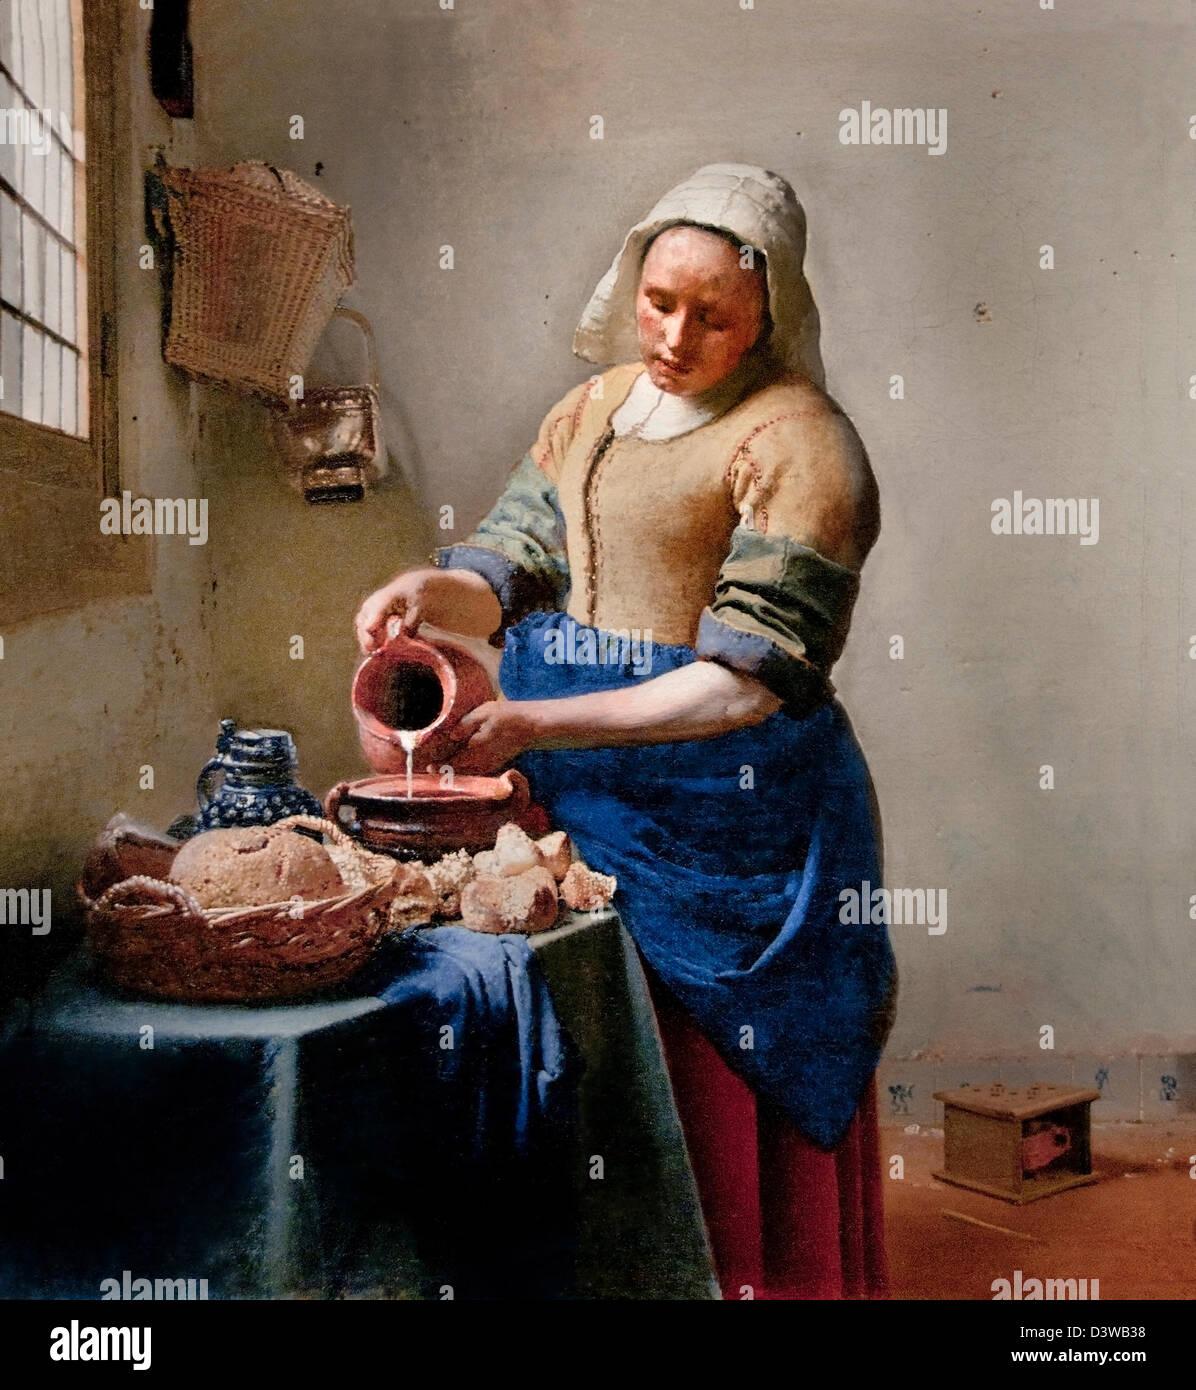 kitchen maid outdoor grill insert johannes vermeer or jan 1632 1675 the milkmaid het melkmeisje 1658 1660 netherlands dutch